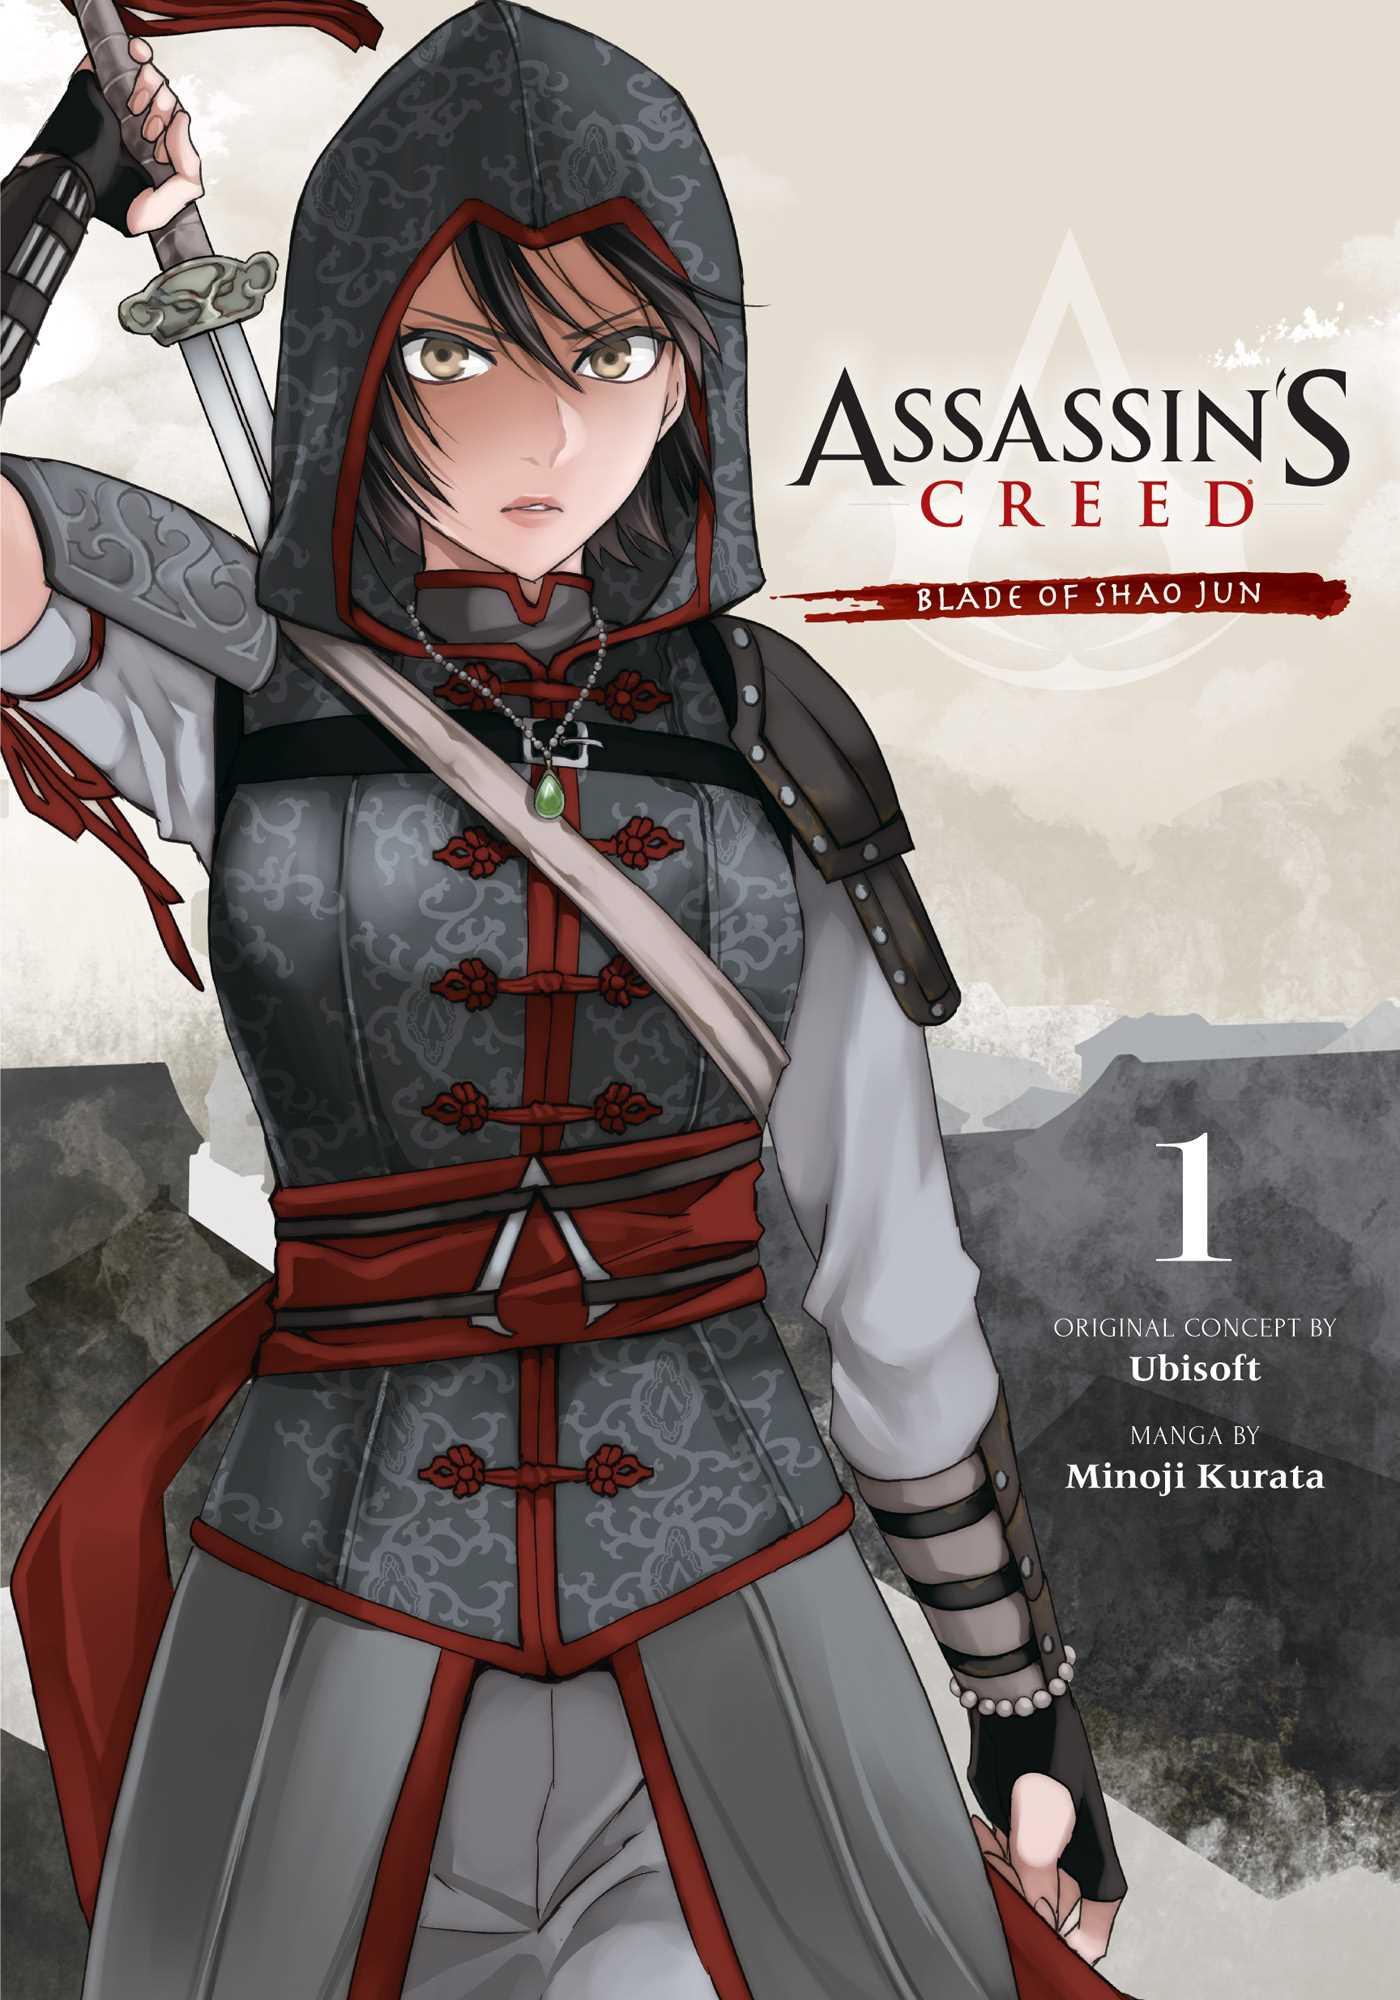 Assassin S Creed Blade Of Shao Jun Vol 1 By Minoji Kurata